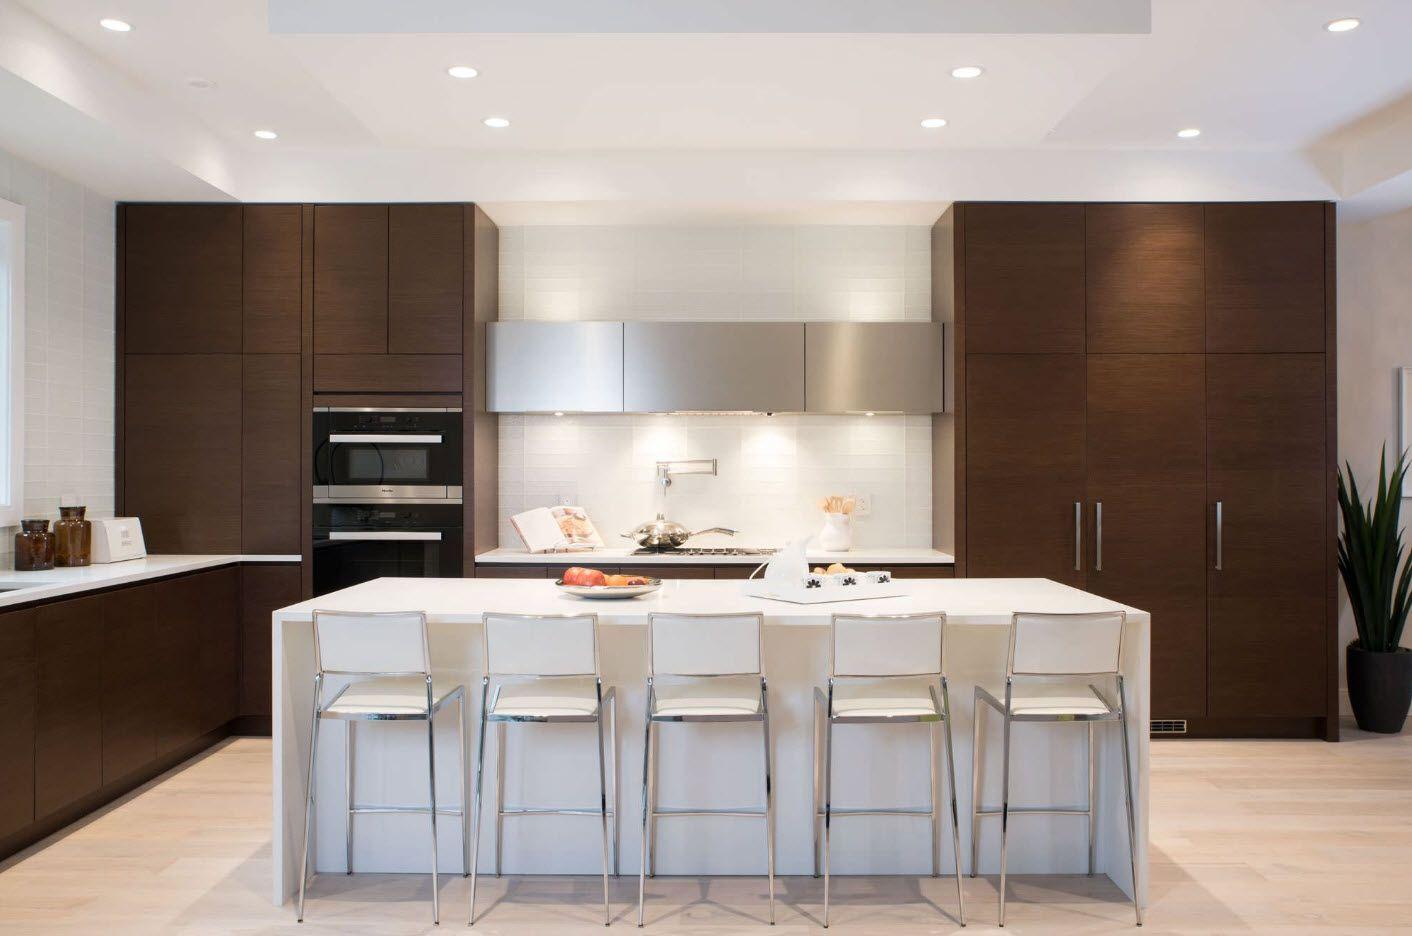 Модерен кухненски интериор